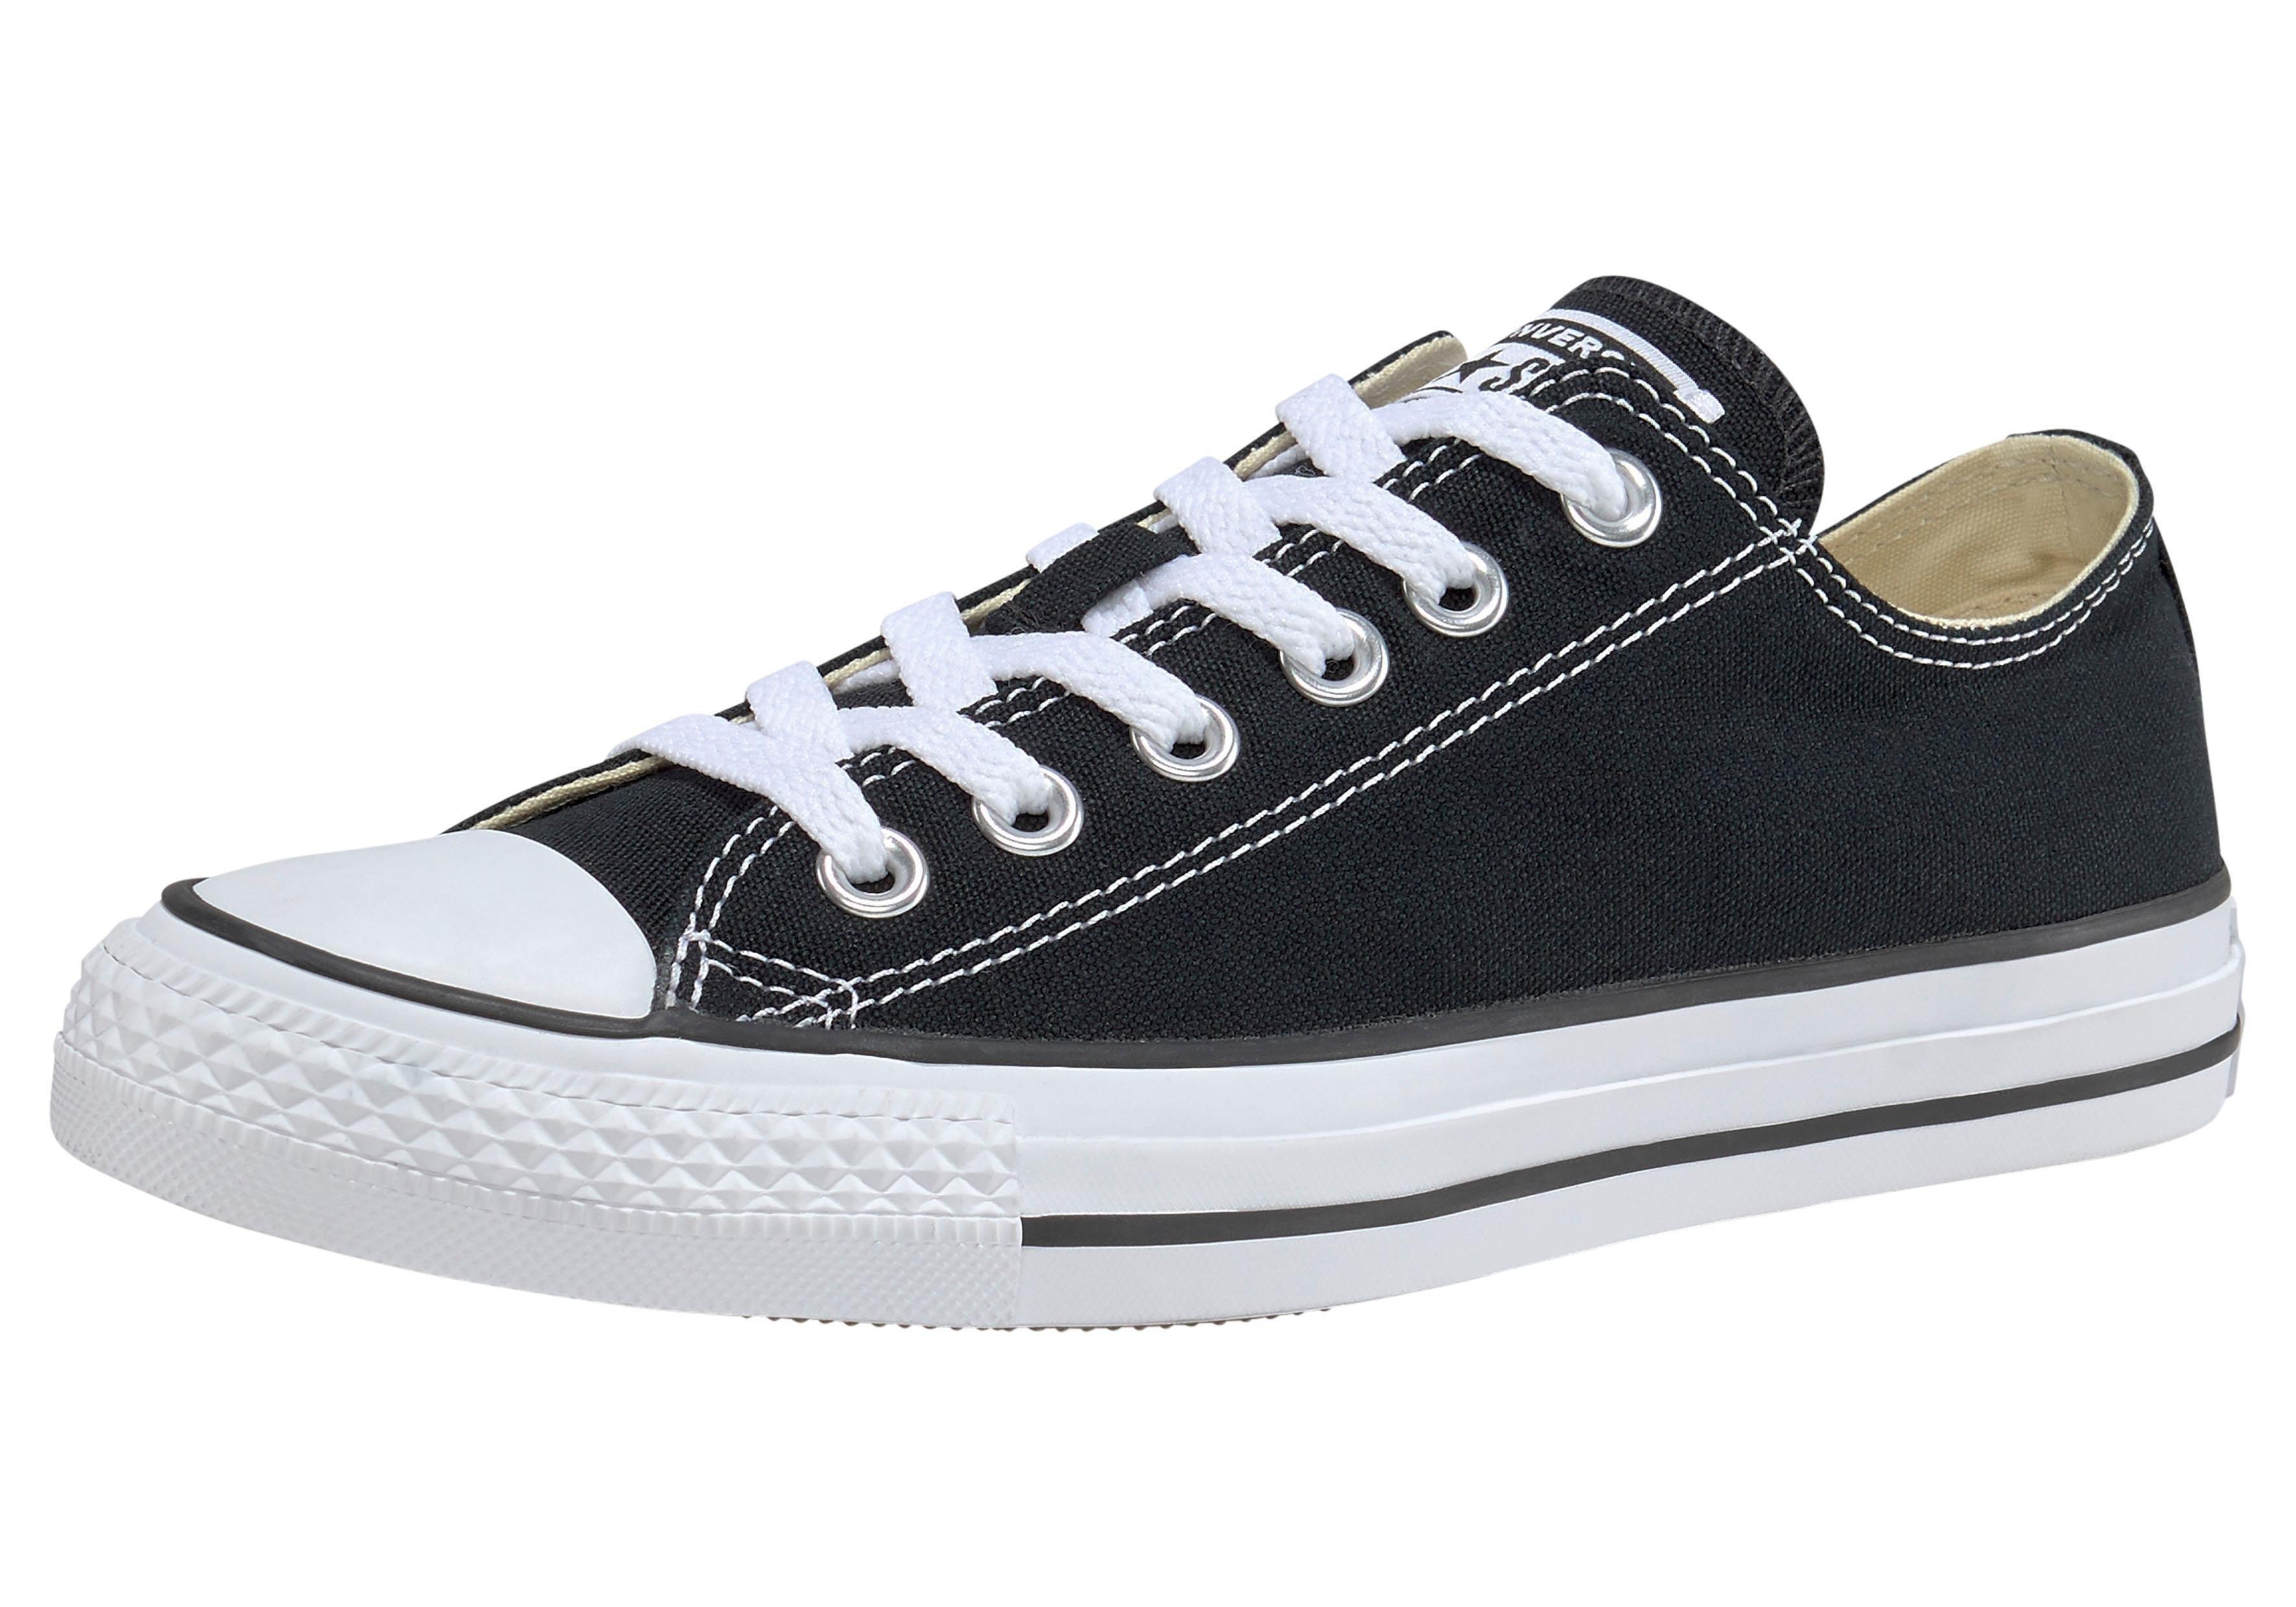 Converse Sneakers Chuck Taylor All Star Core Ox - gratis ruilen op otto.nl